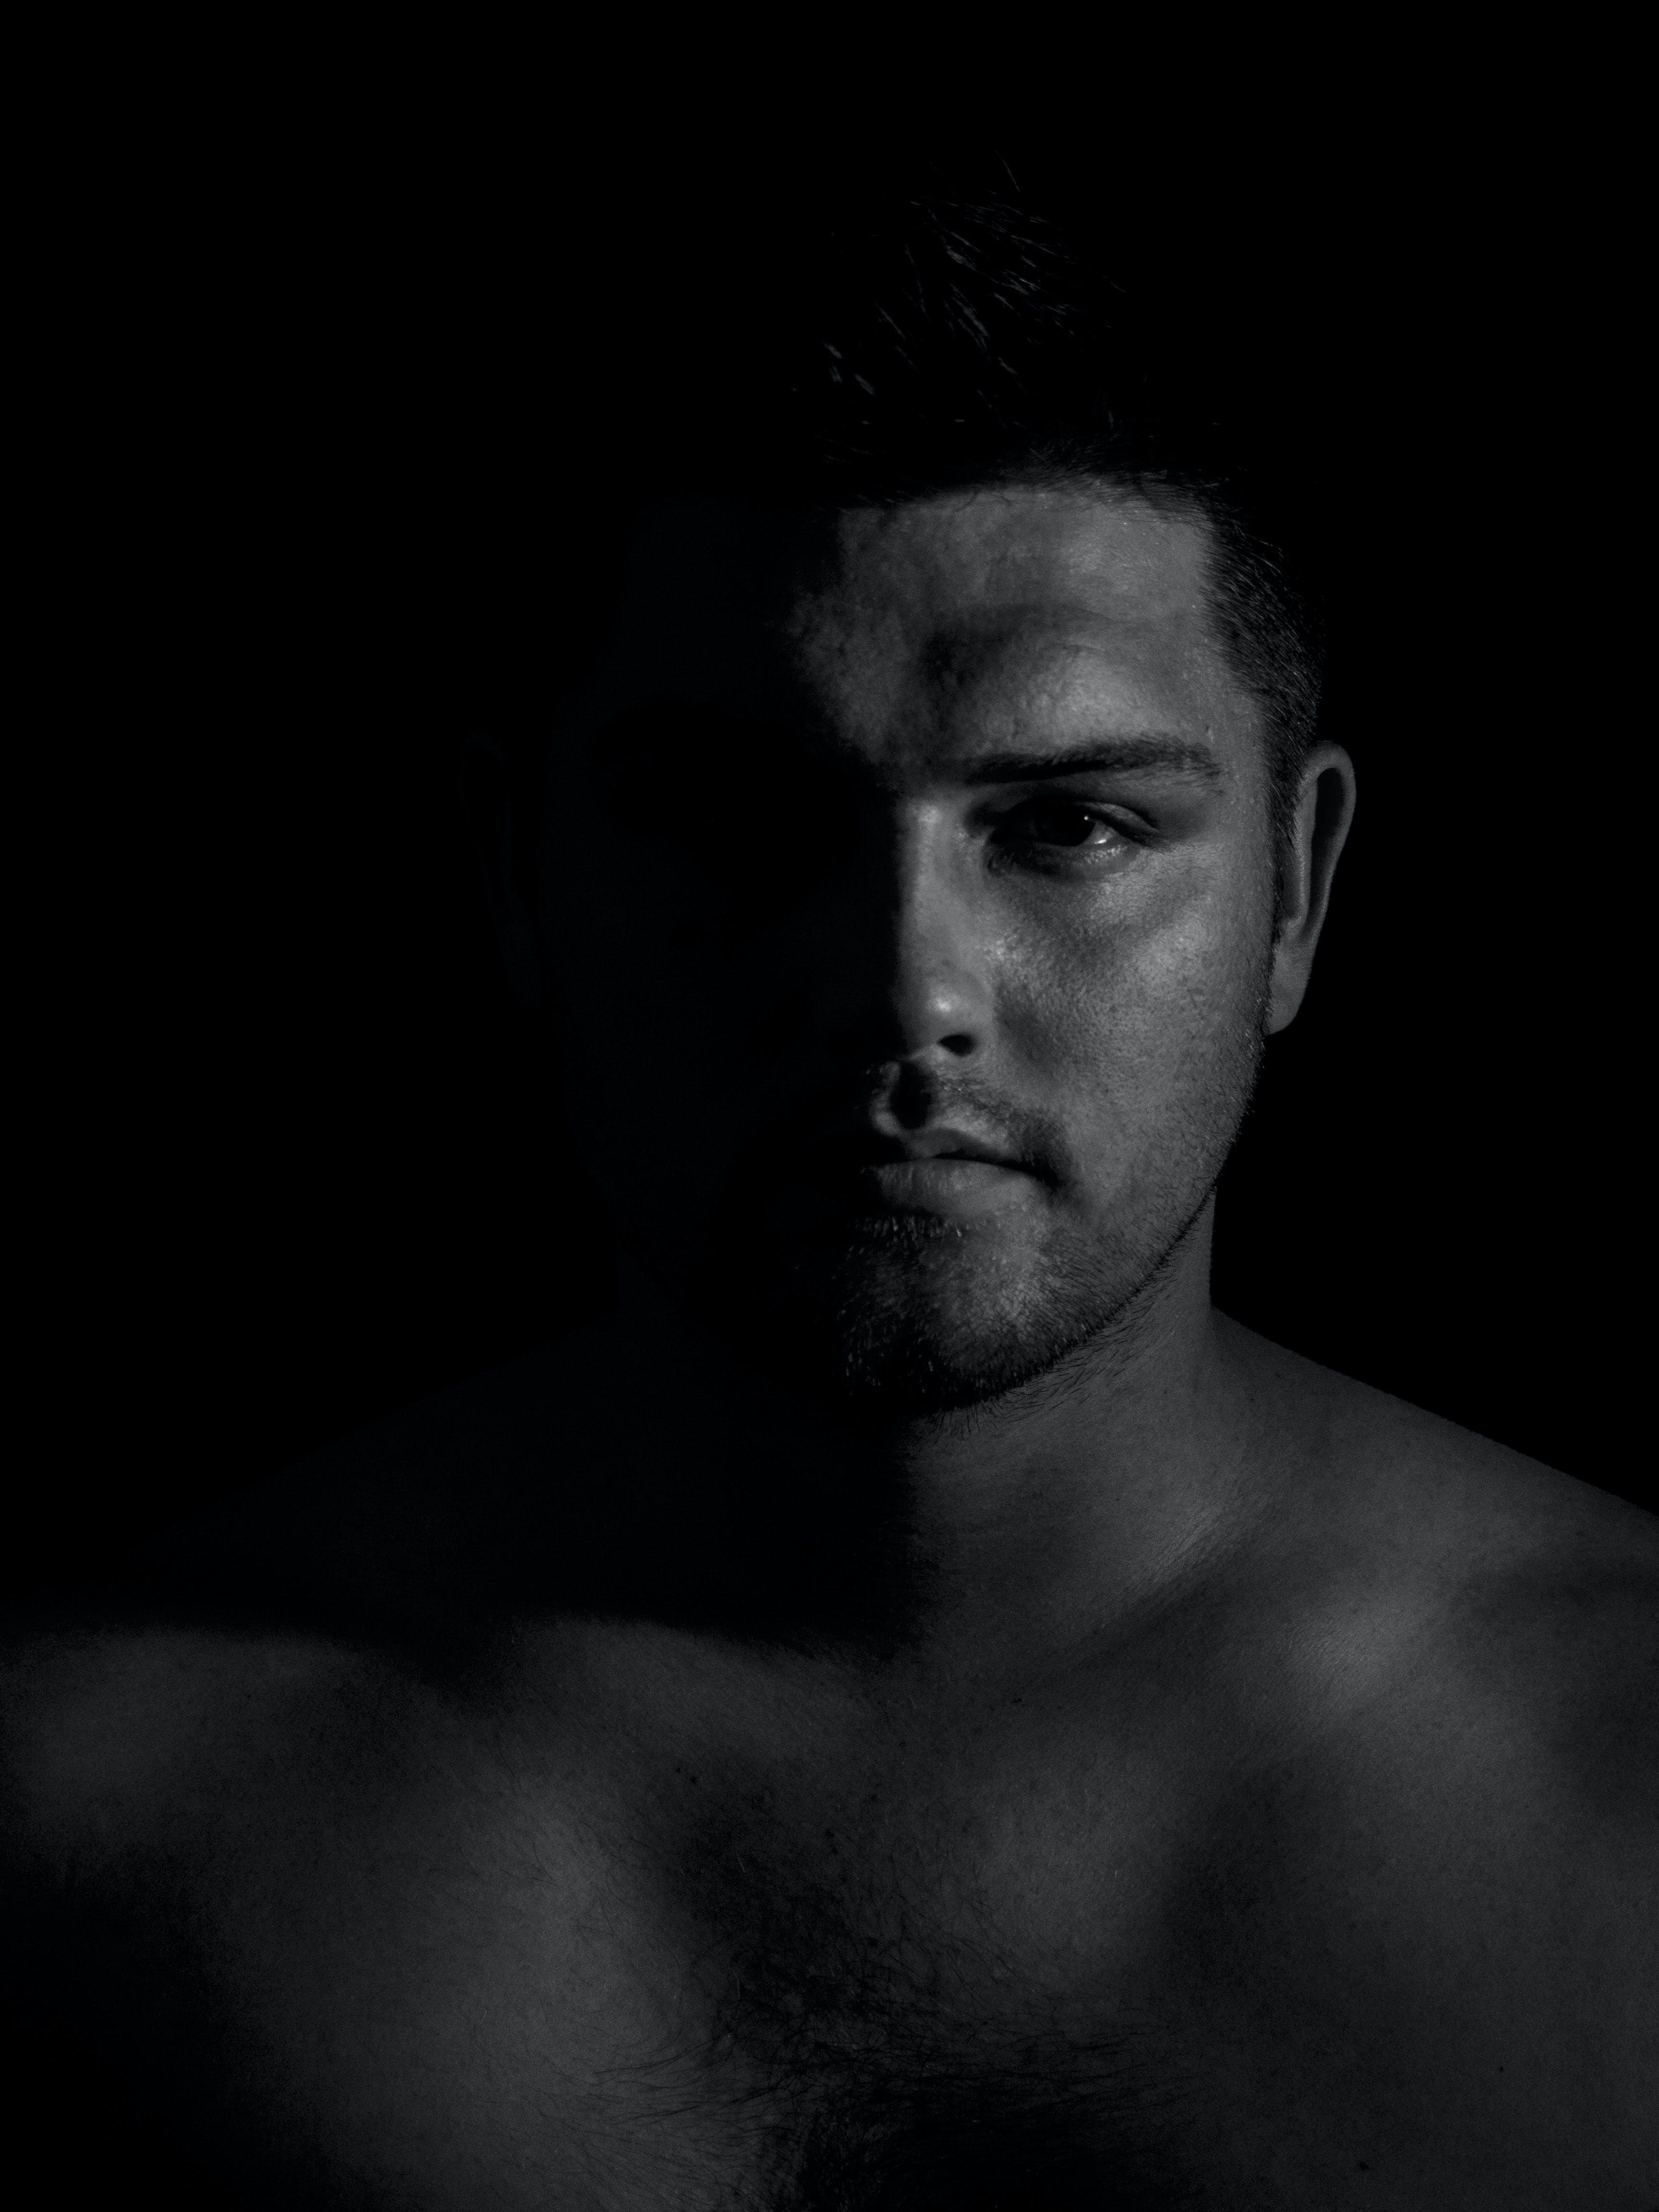 Free stock photo of b&w, beard, black, black and white